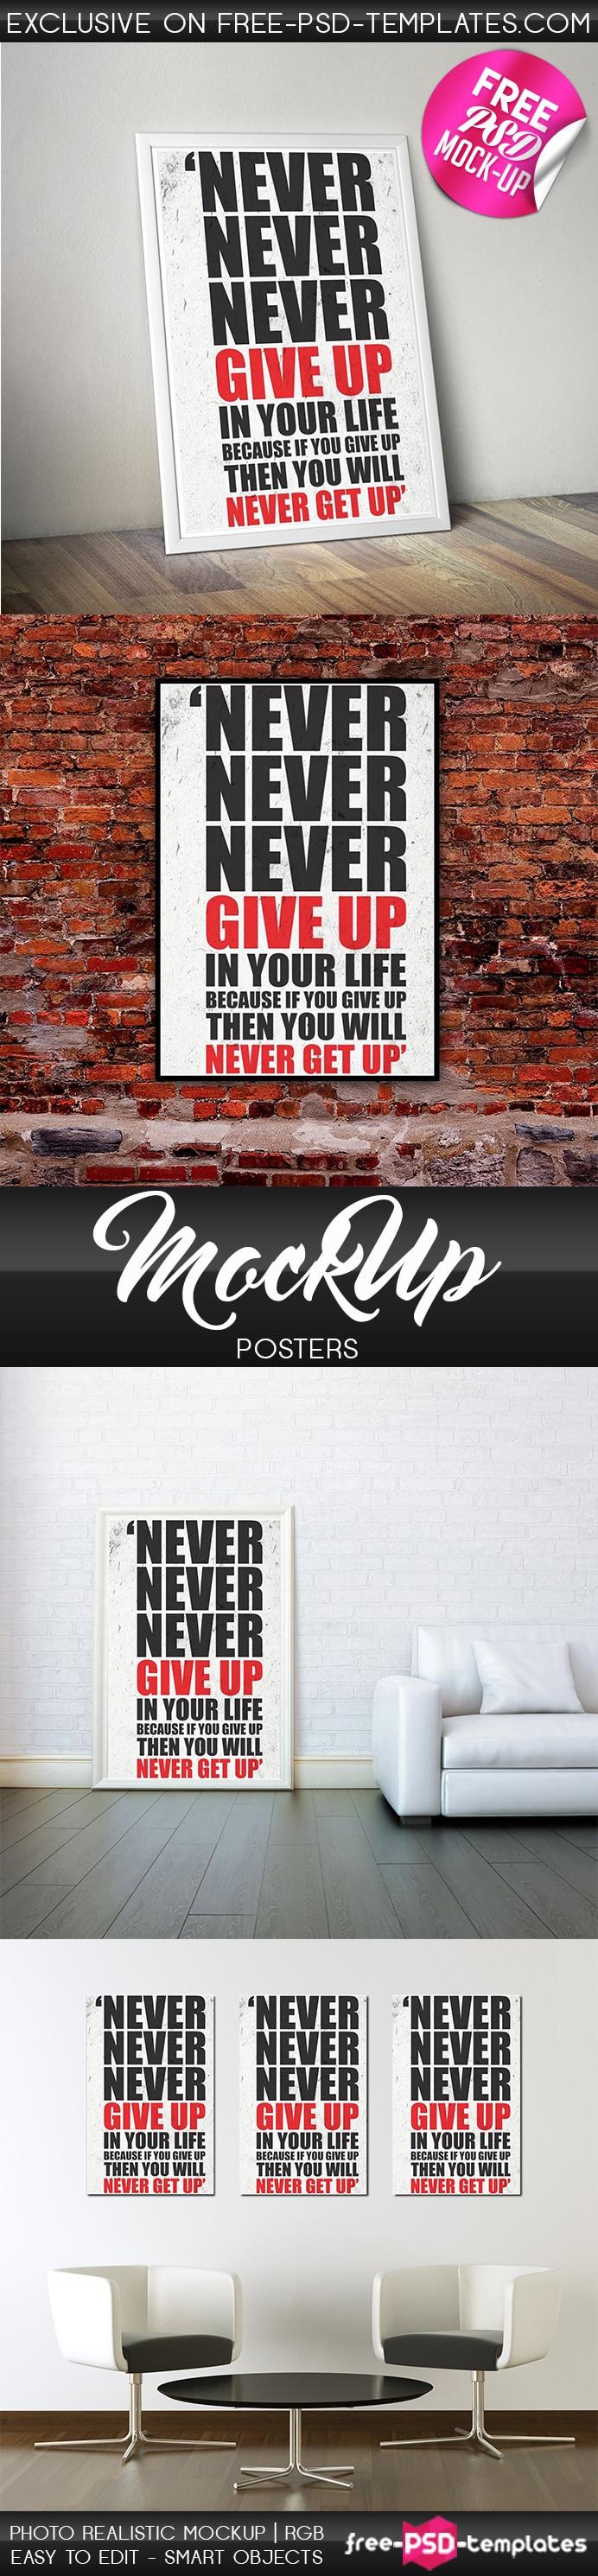 free poster PSD mockup